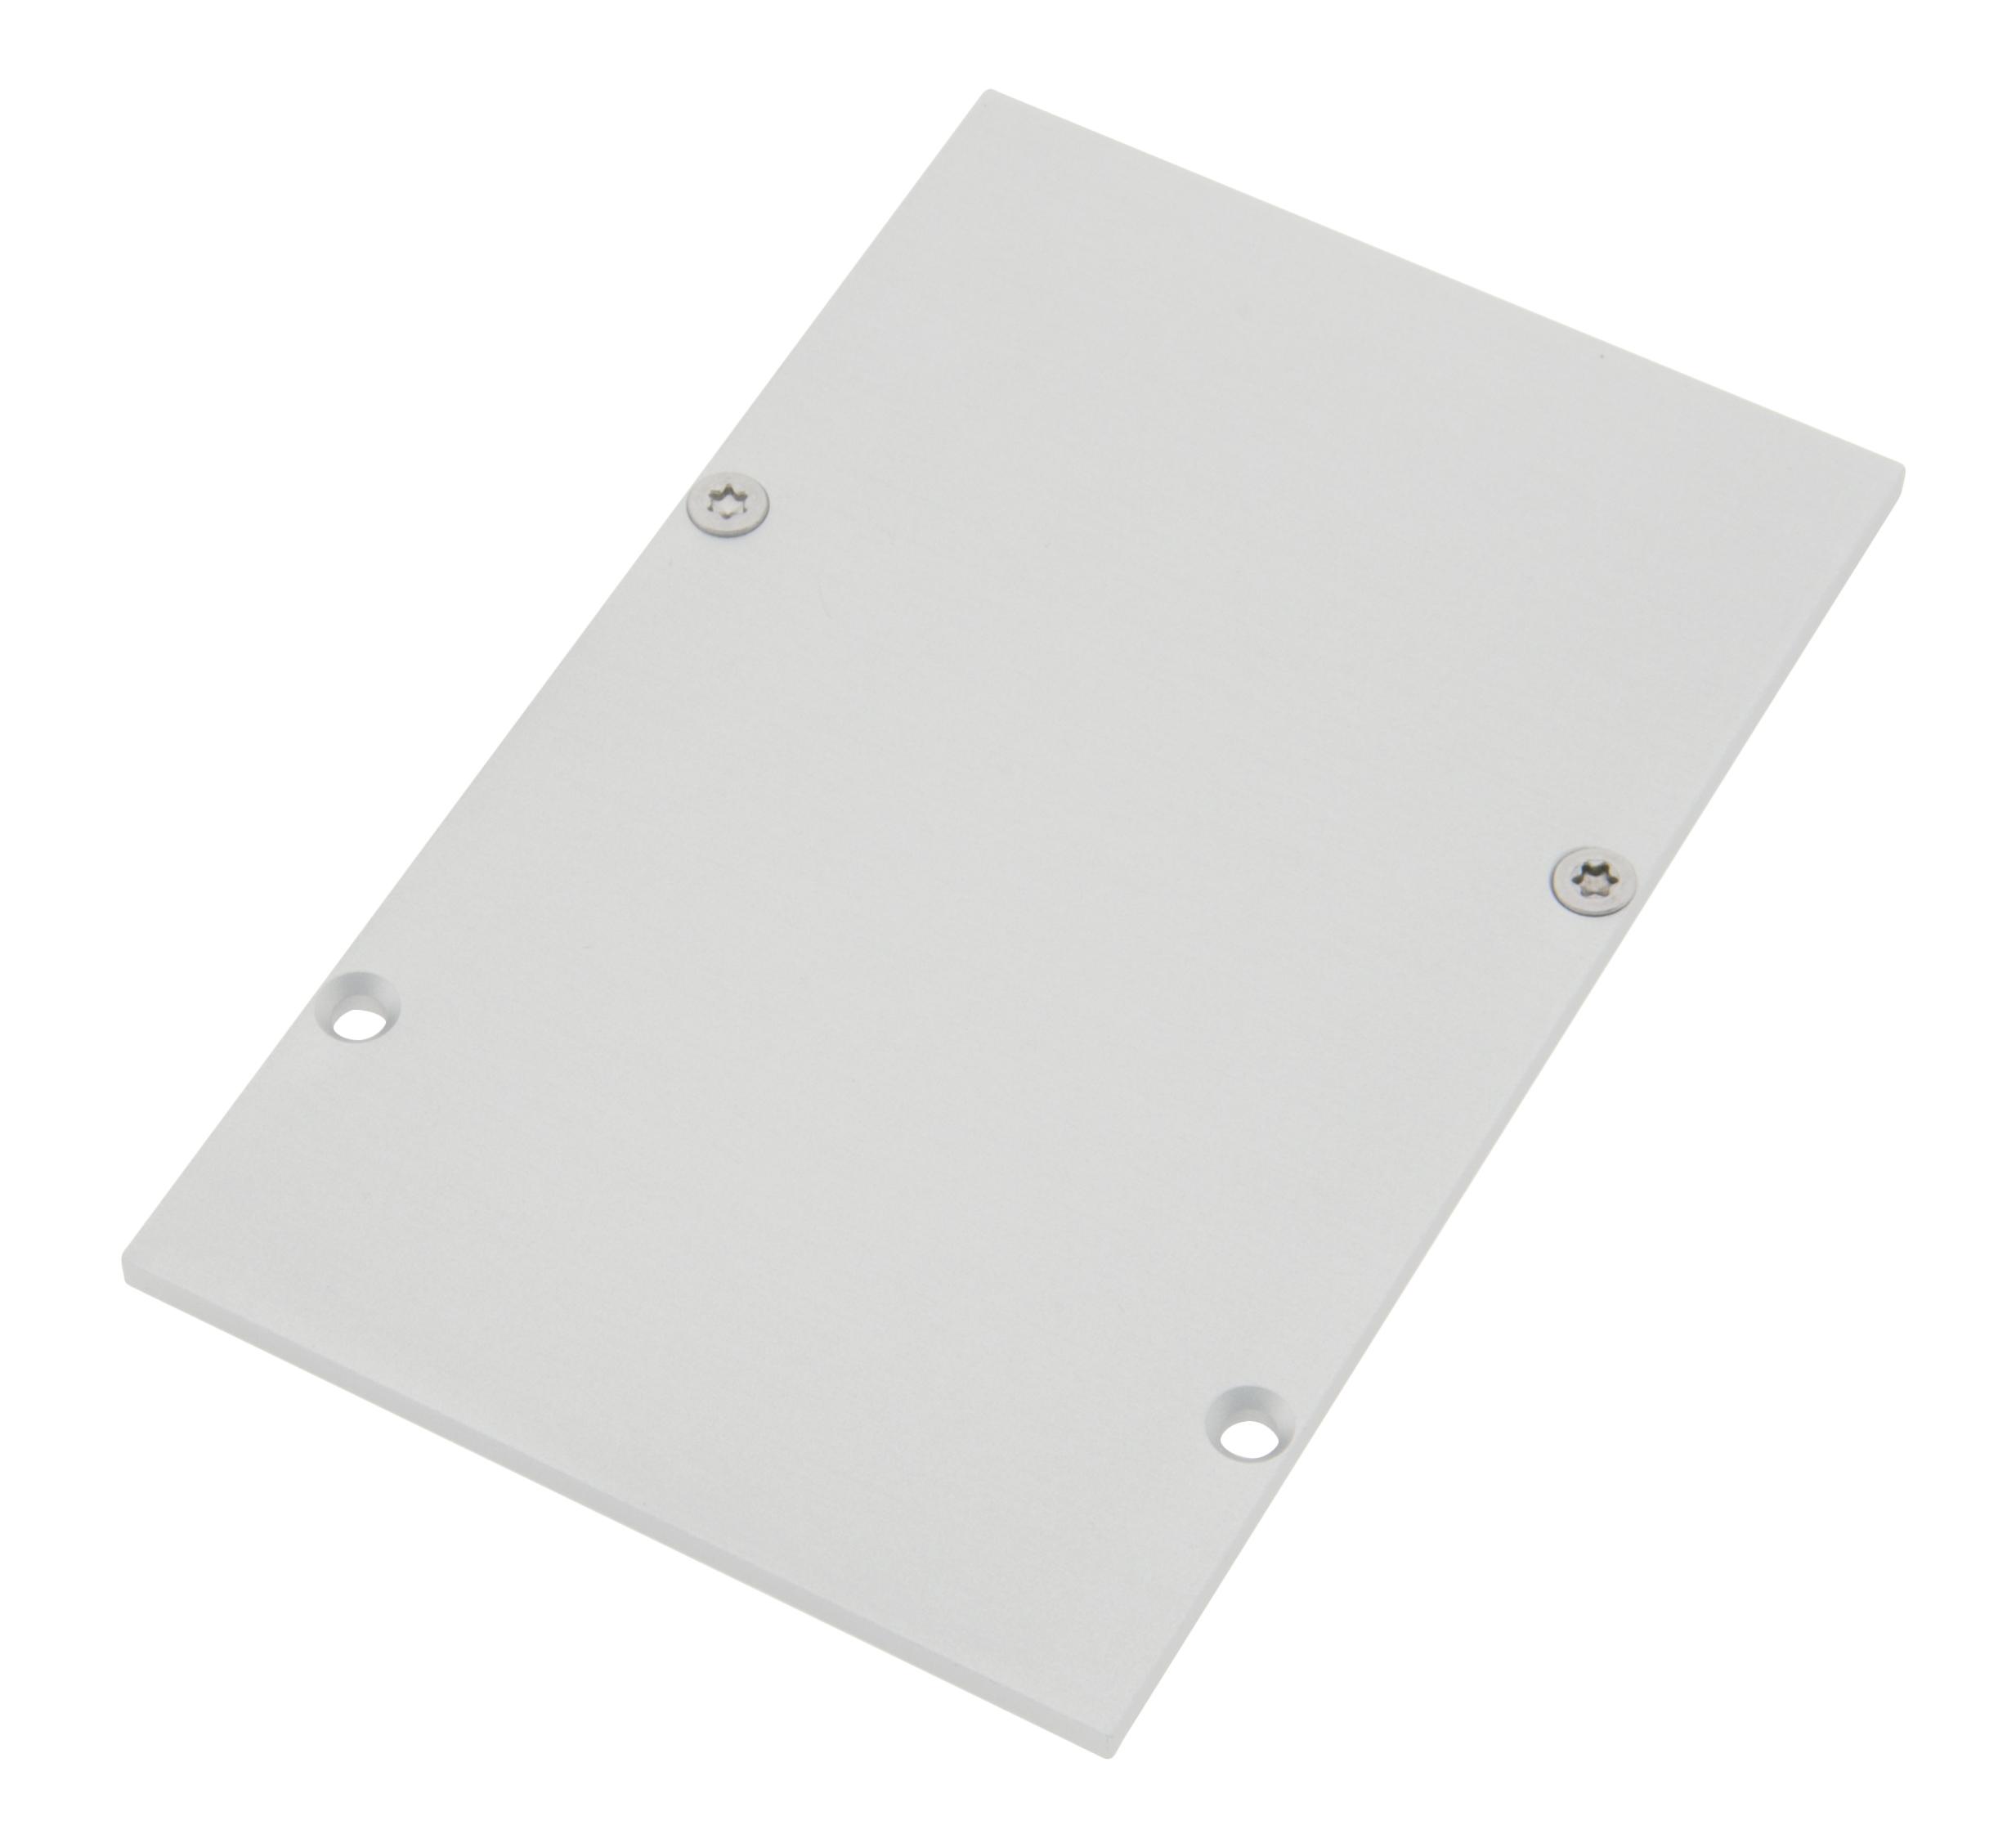 1 Stk Profil Endkappe SLH Eckig geschlossen inkl. Schrauben LIEK003420